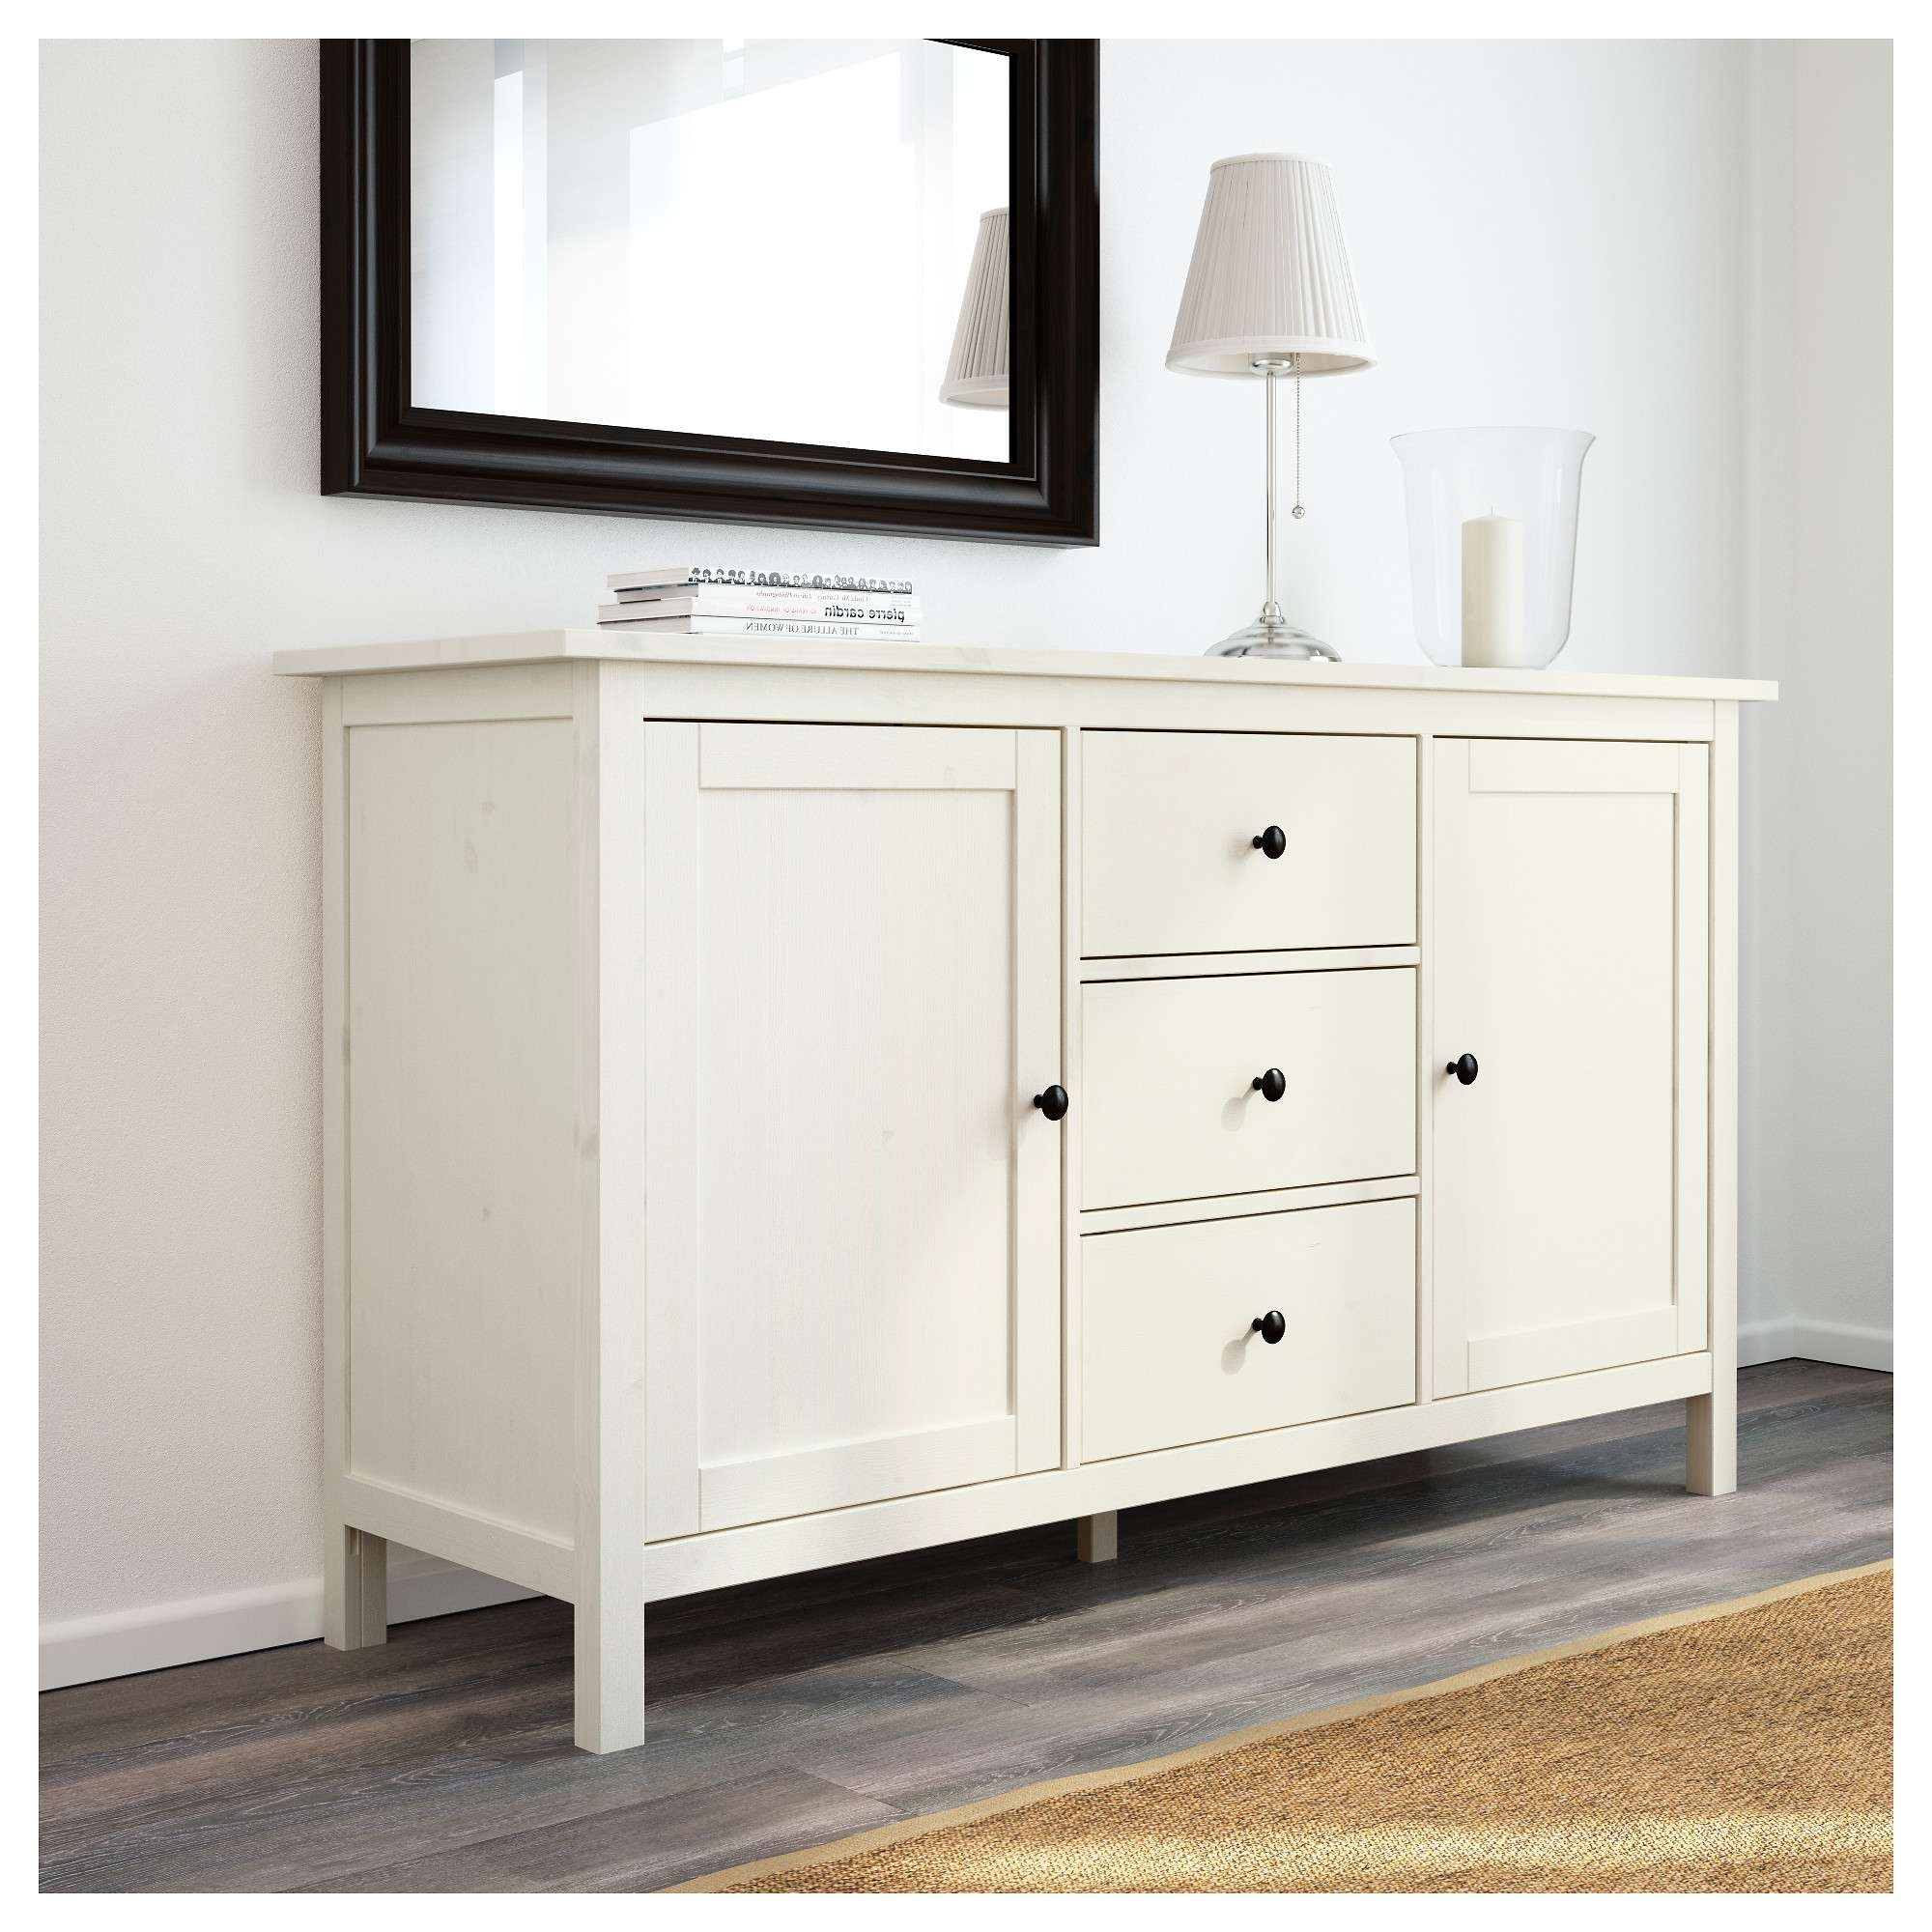 Hemnes Sideboard White Stain 157X88 Cm – Ikea Throughout Ikea Hemnes Sideboards (Gallery 2 of 20)